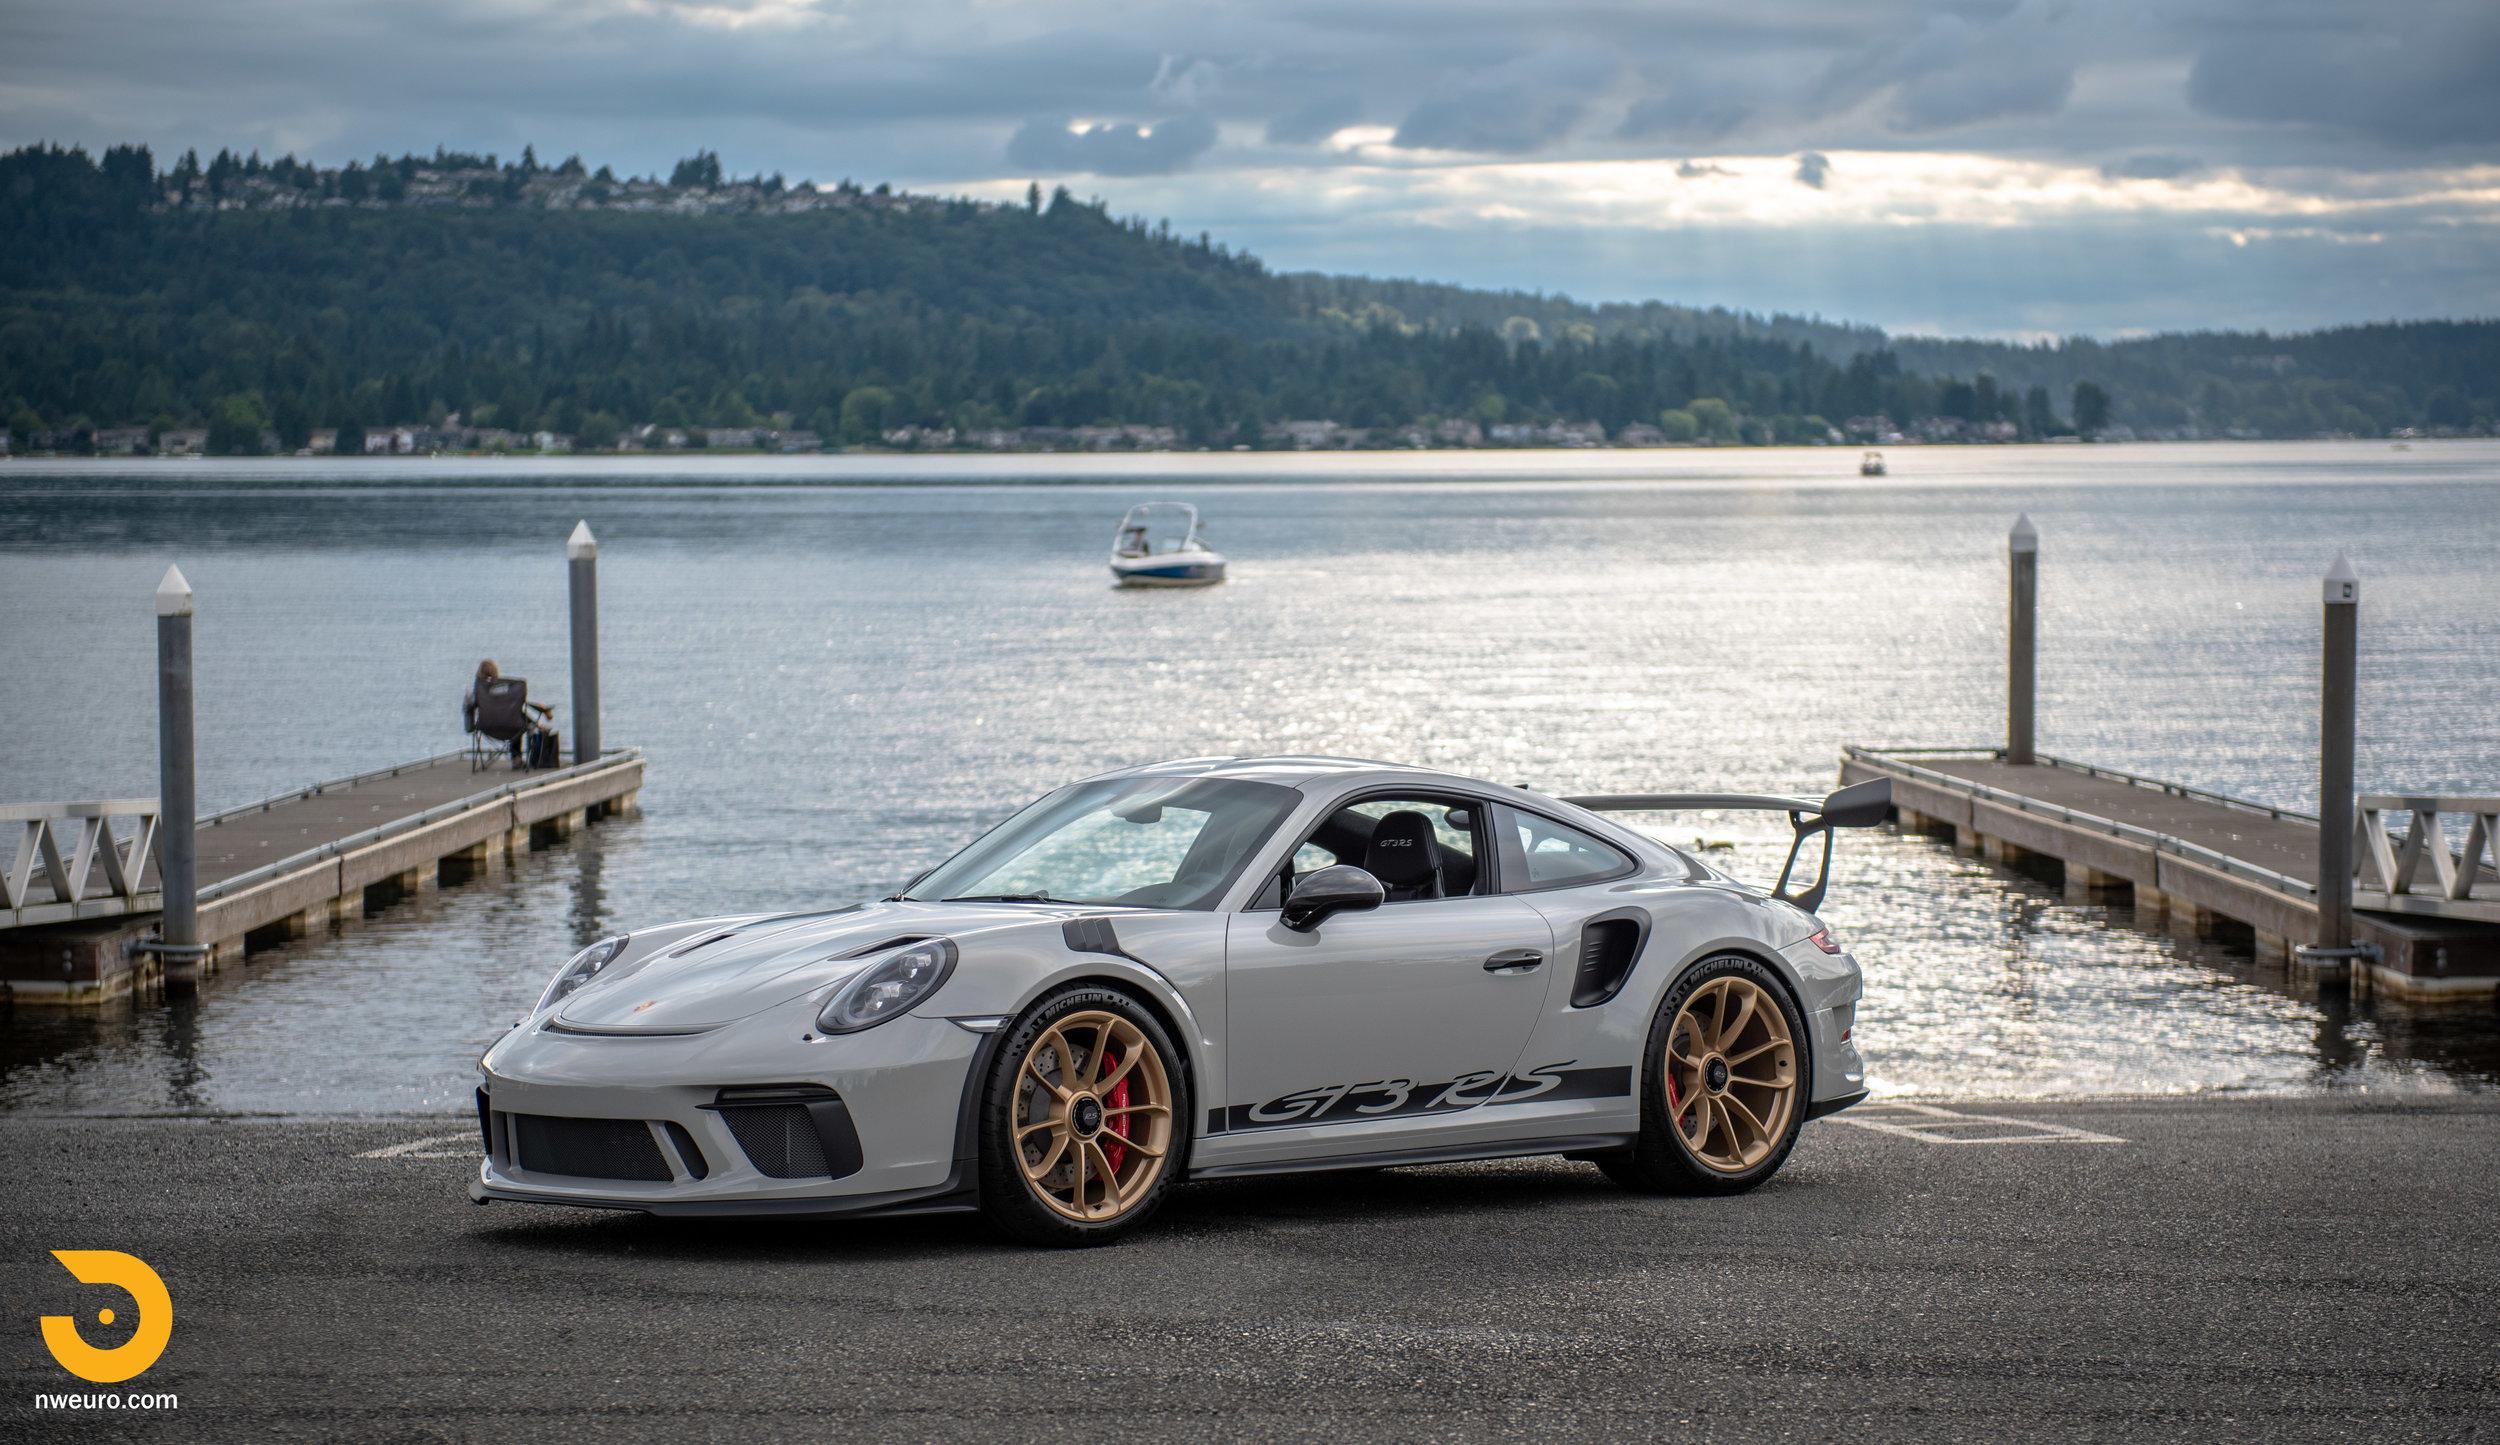 2019 Porsche GT3 RS - Chalk-21.jpg